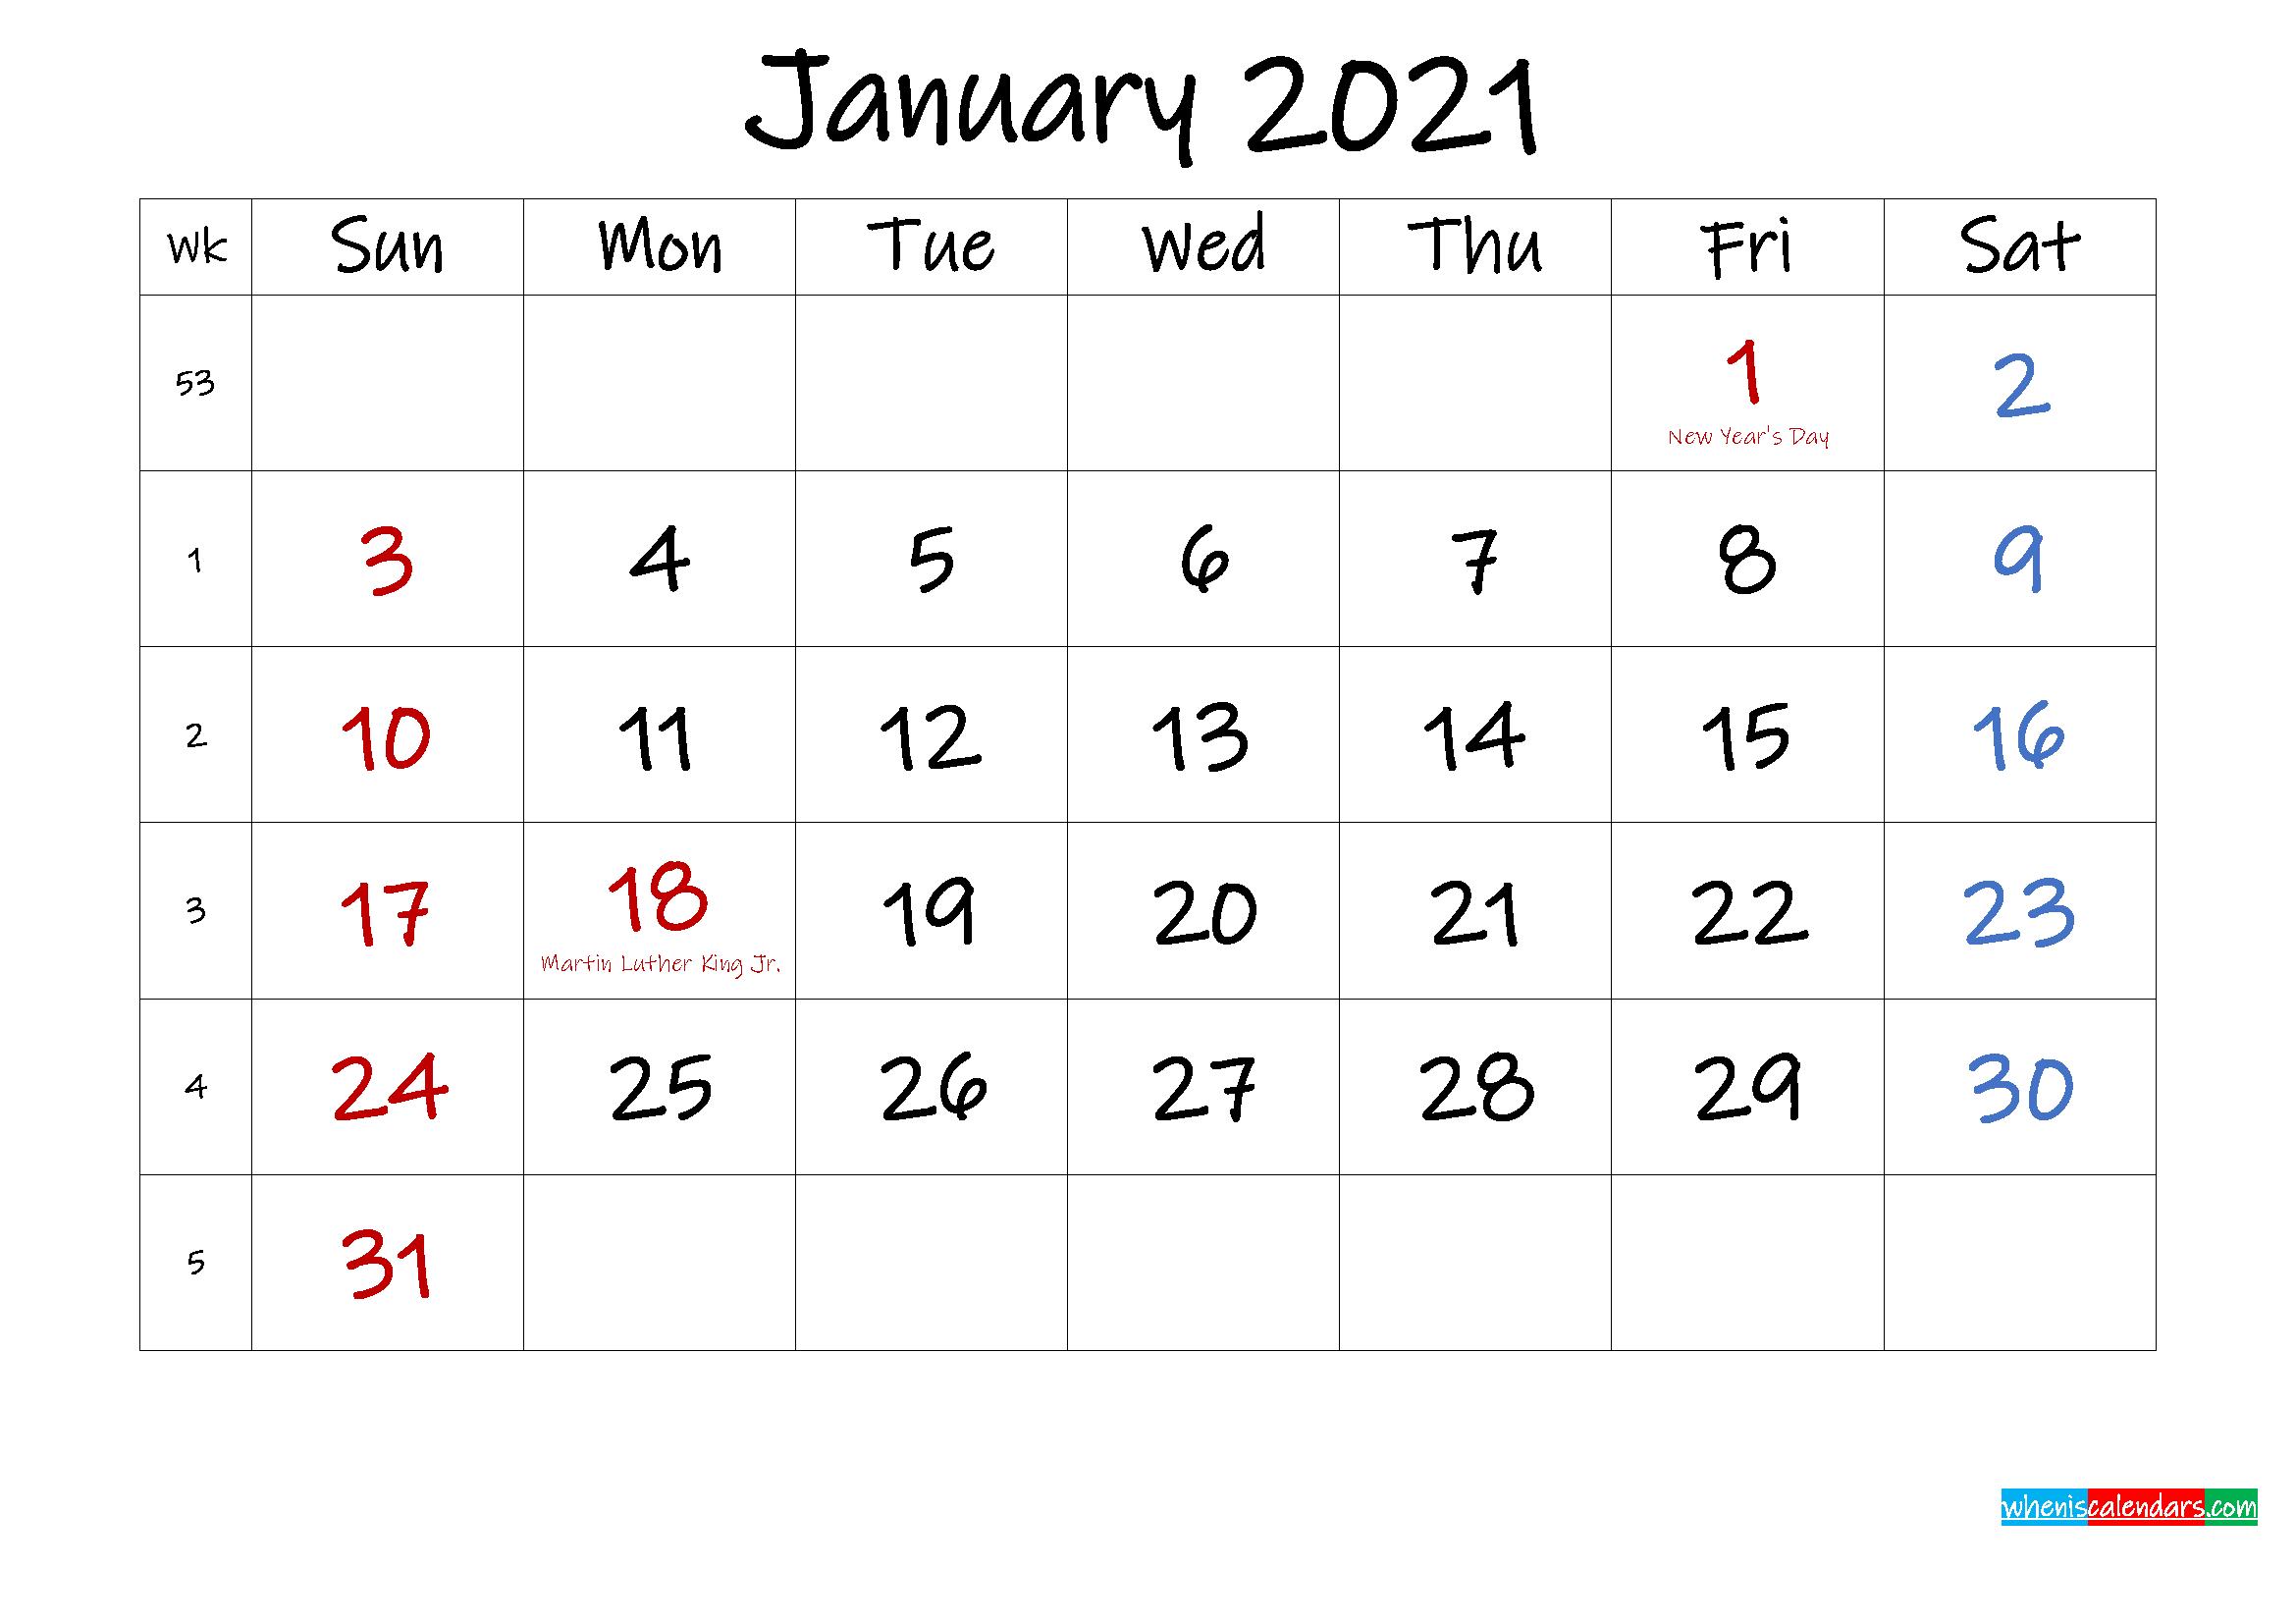 January 2021 Free Printable Calendar with Holidays